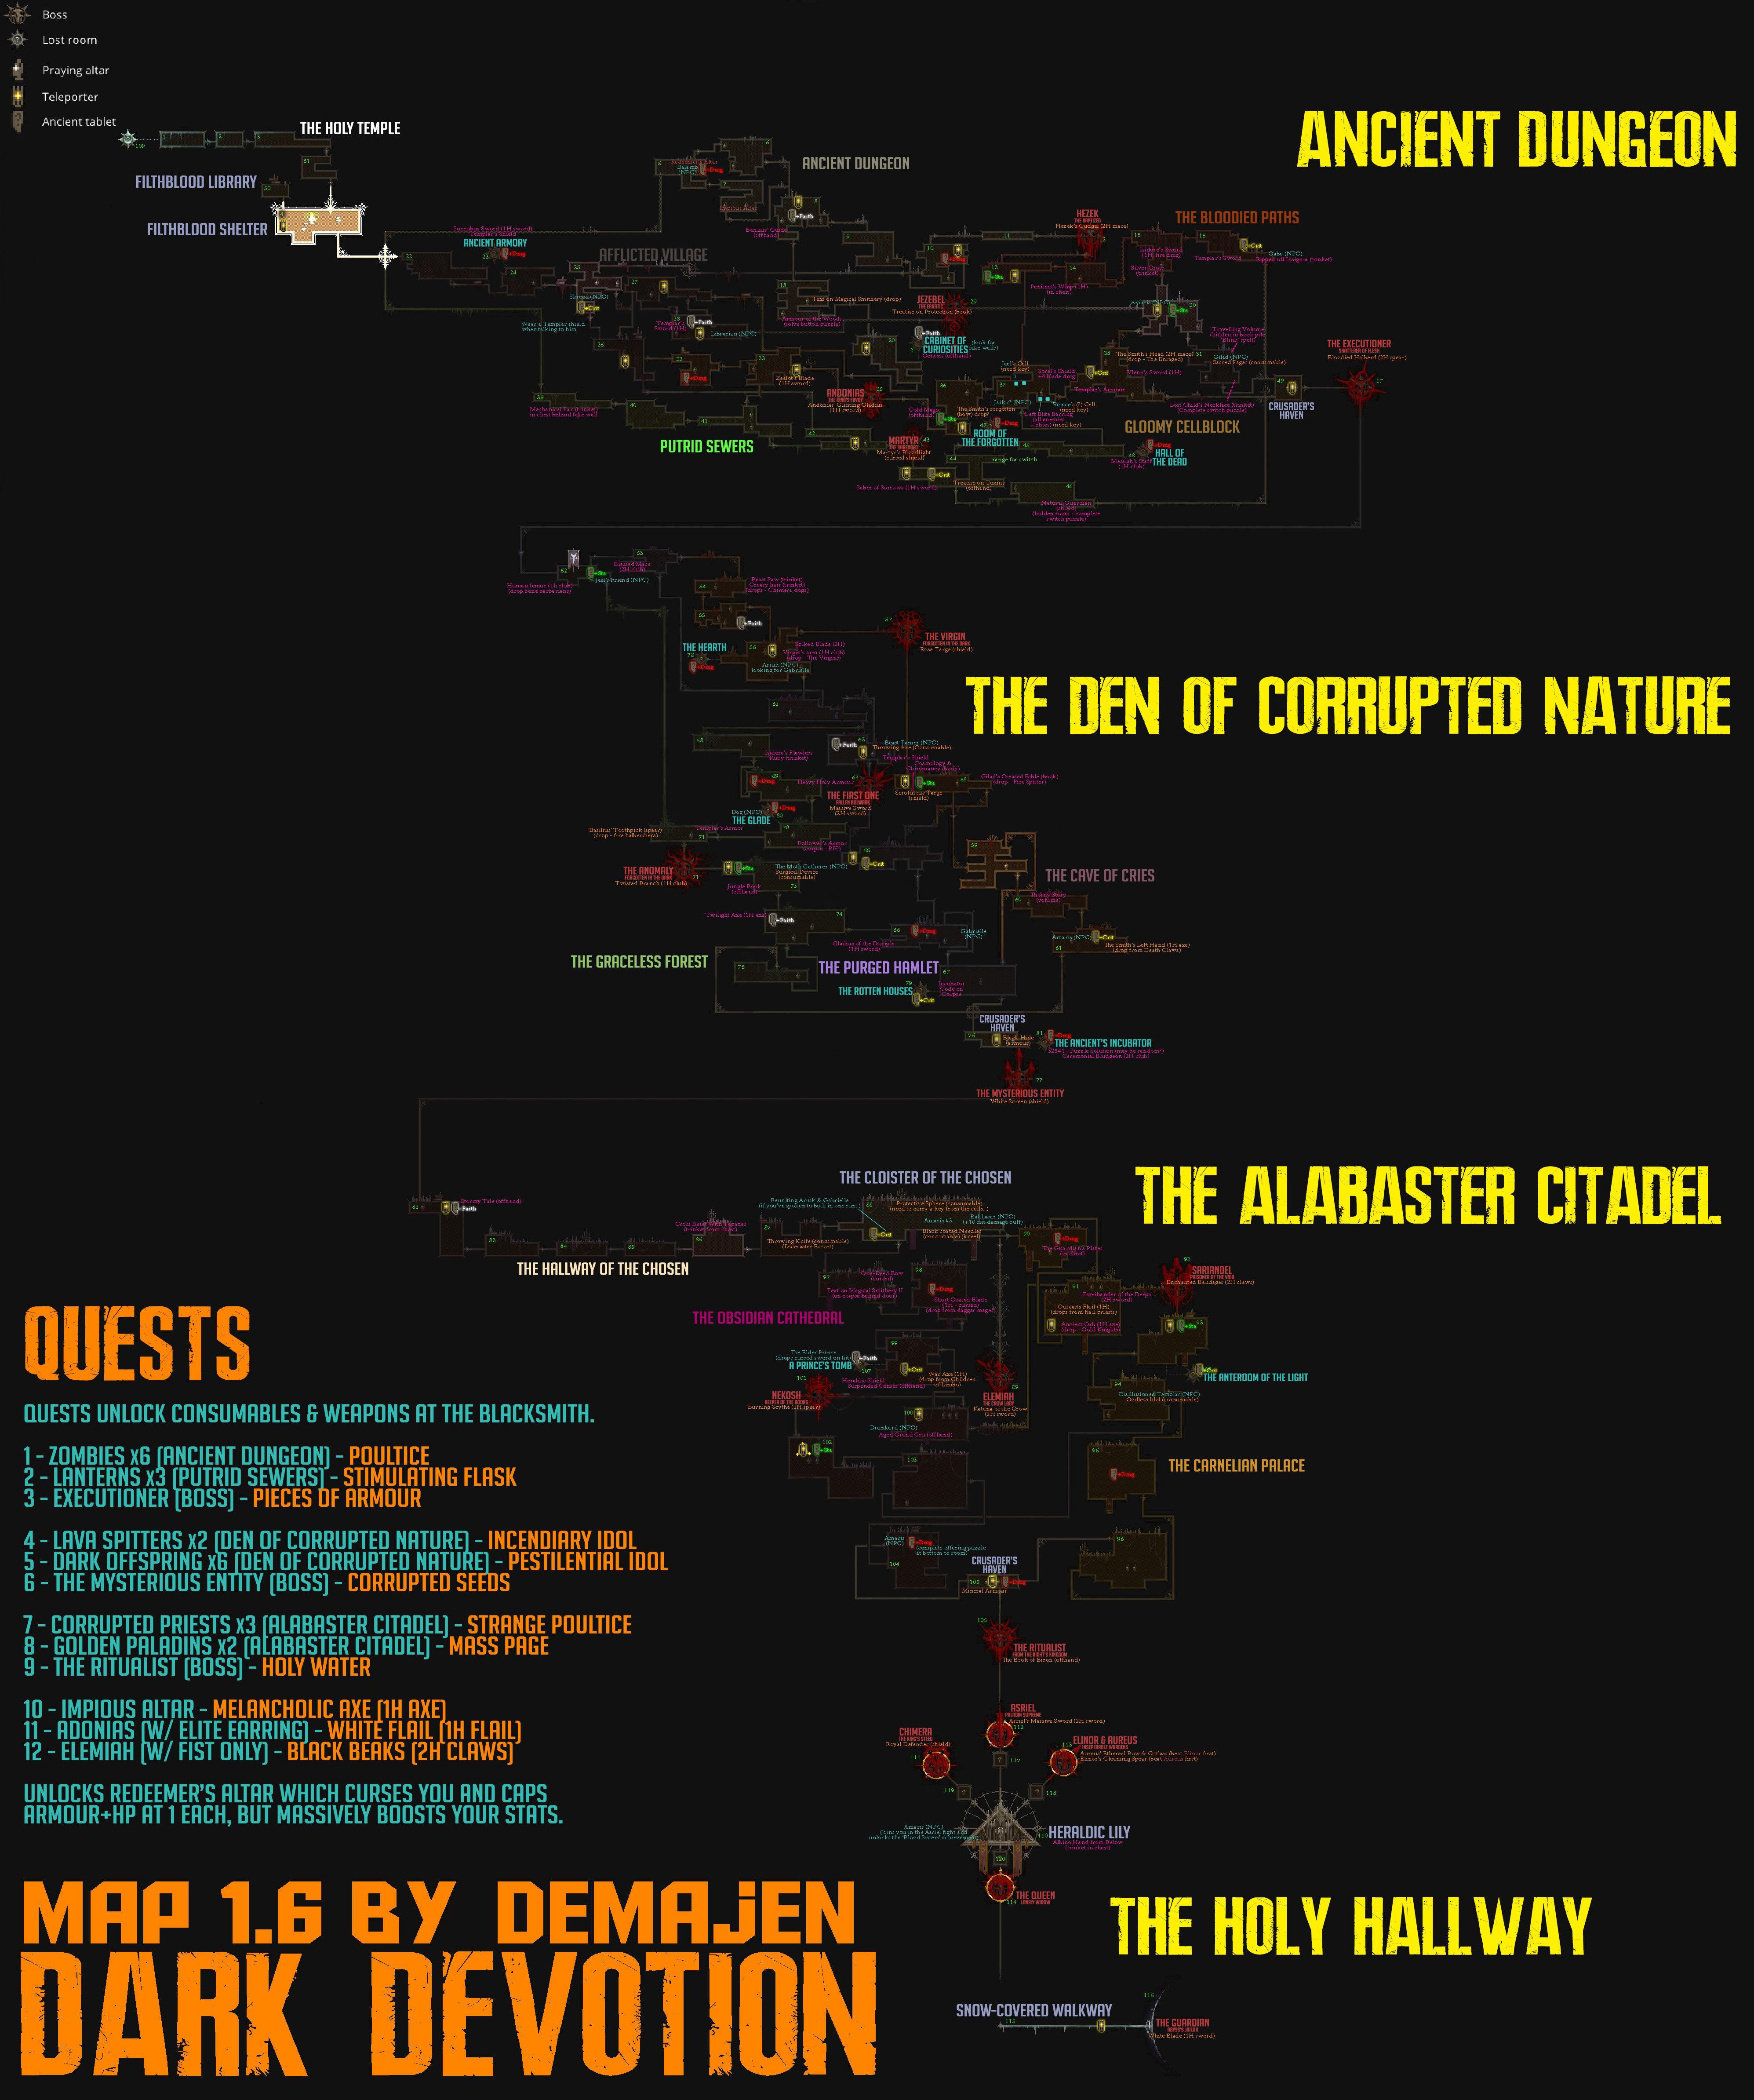 Darkdevotionmap1-6.jpg